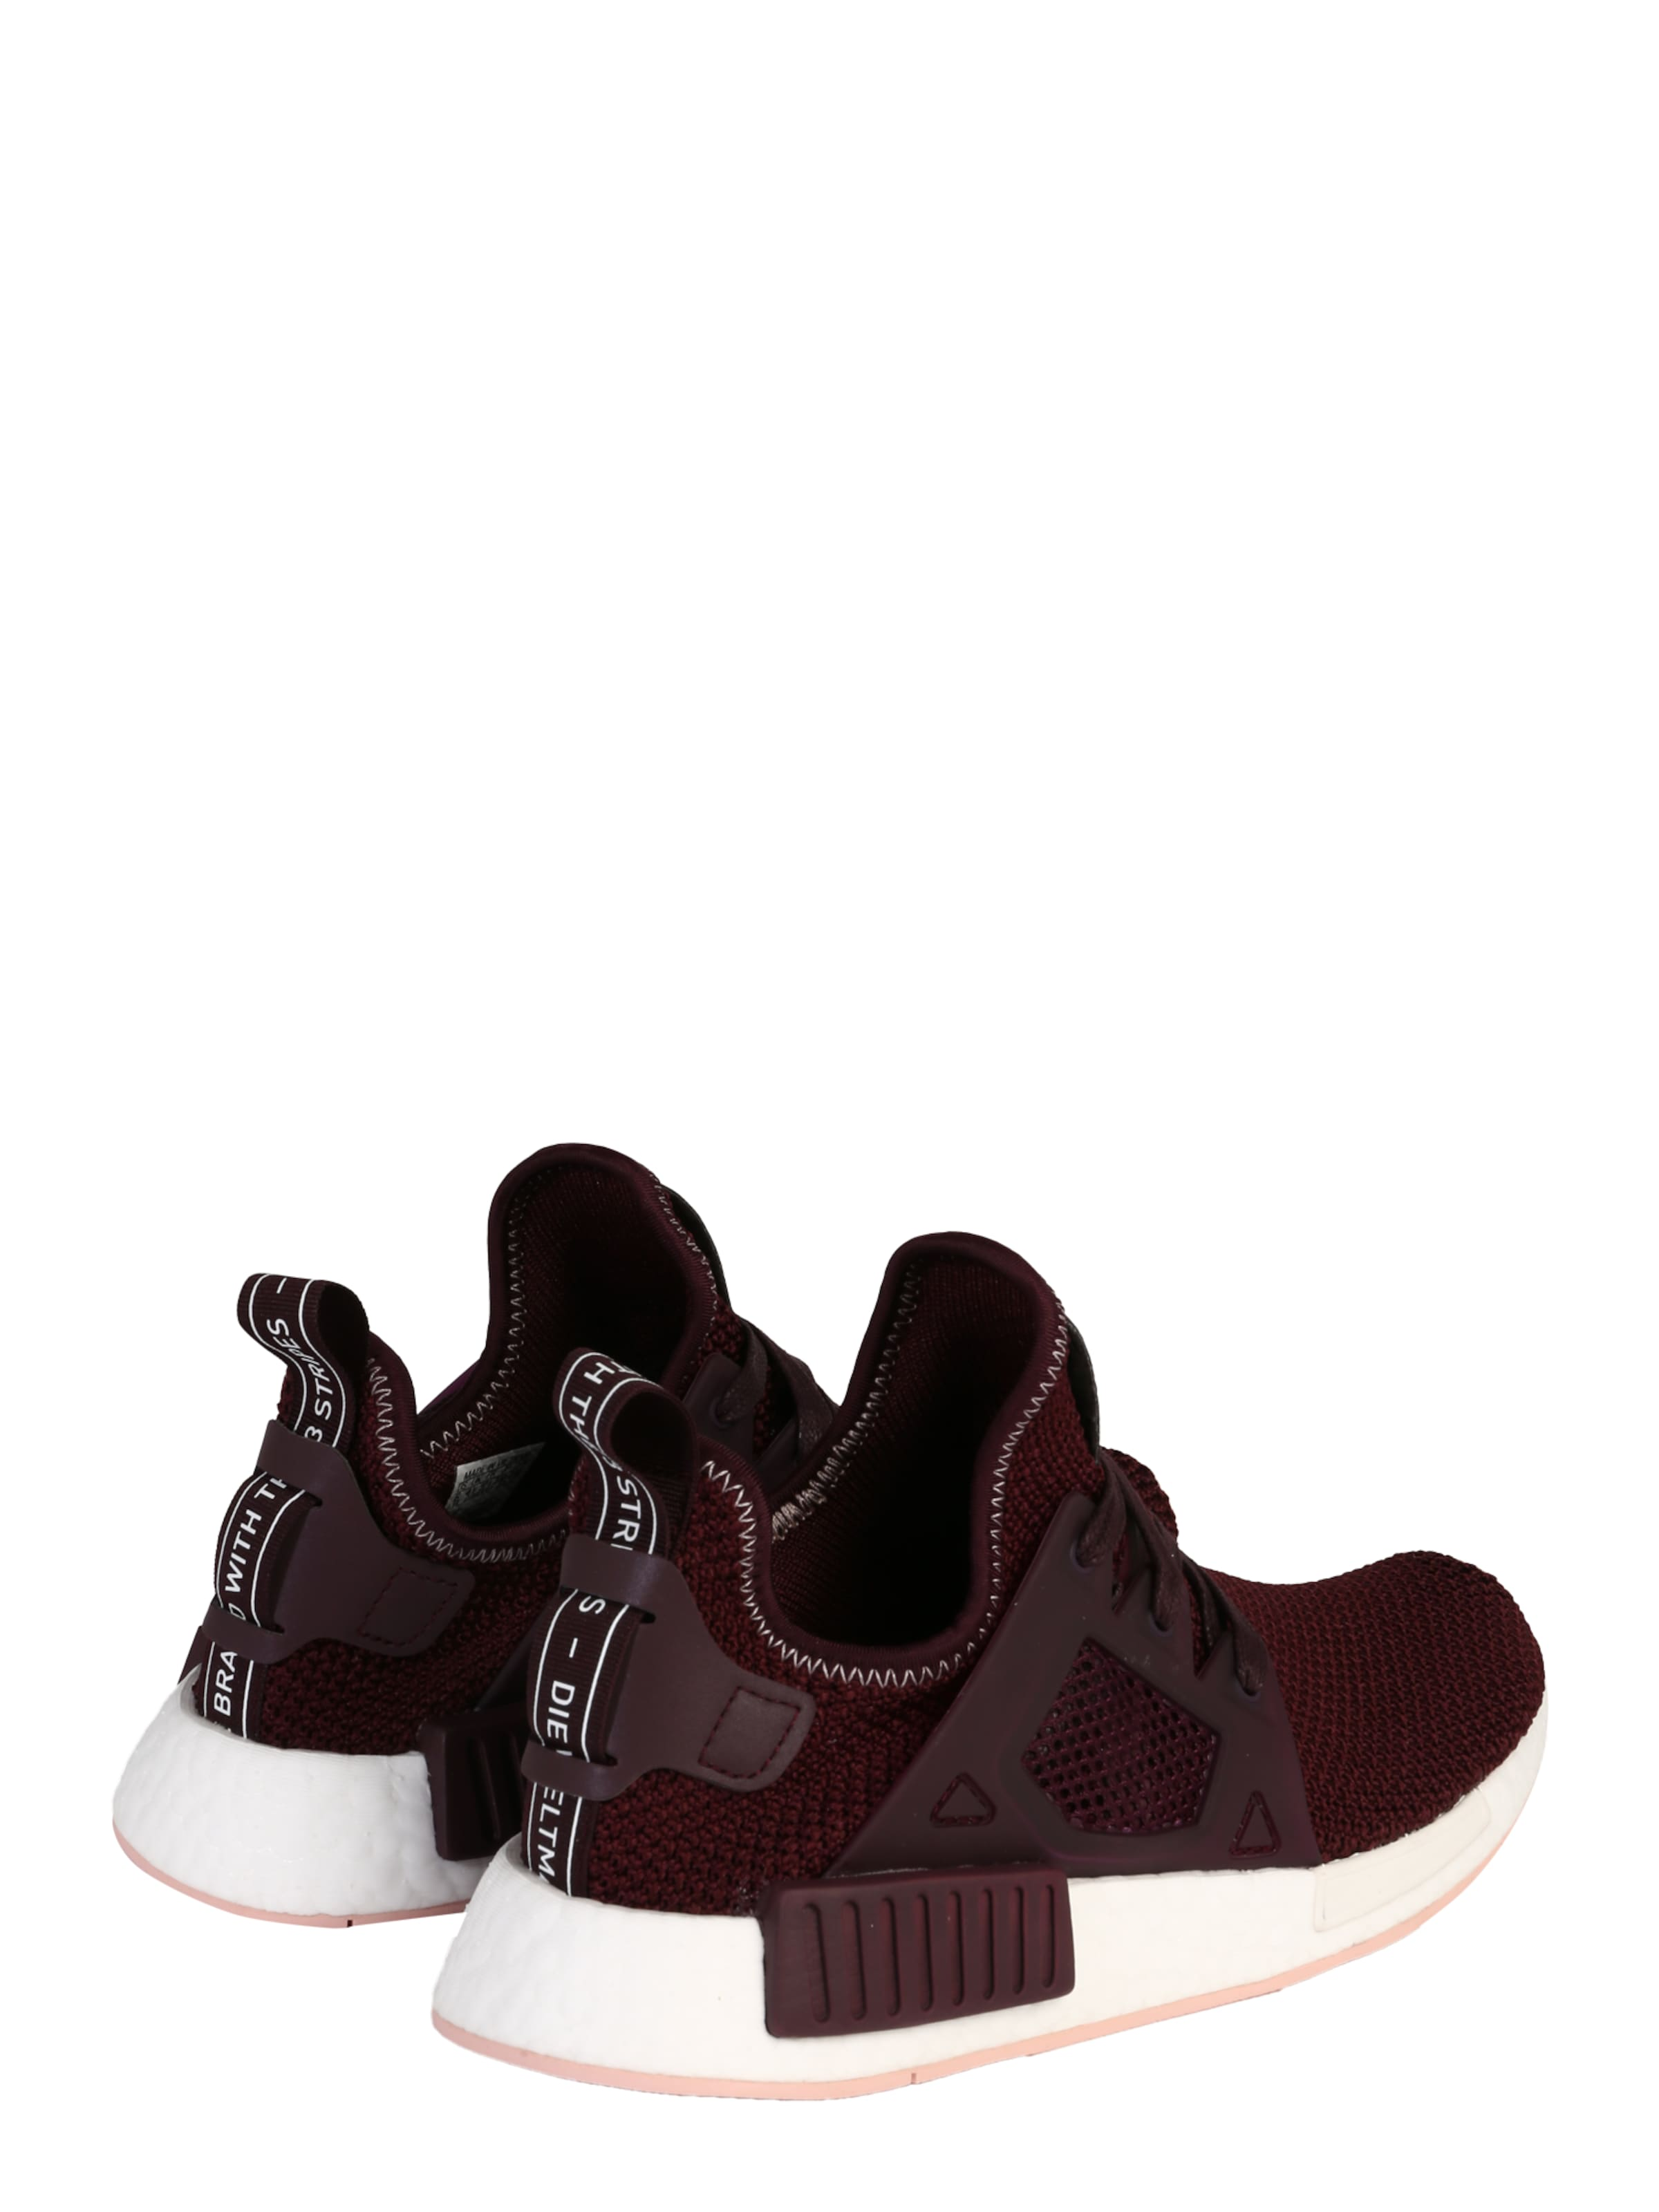 xr1' Originals In Adidas 'nmd Sneaker Burgunder P0nOwk